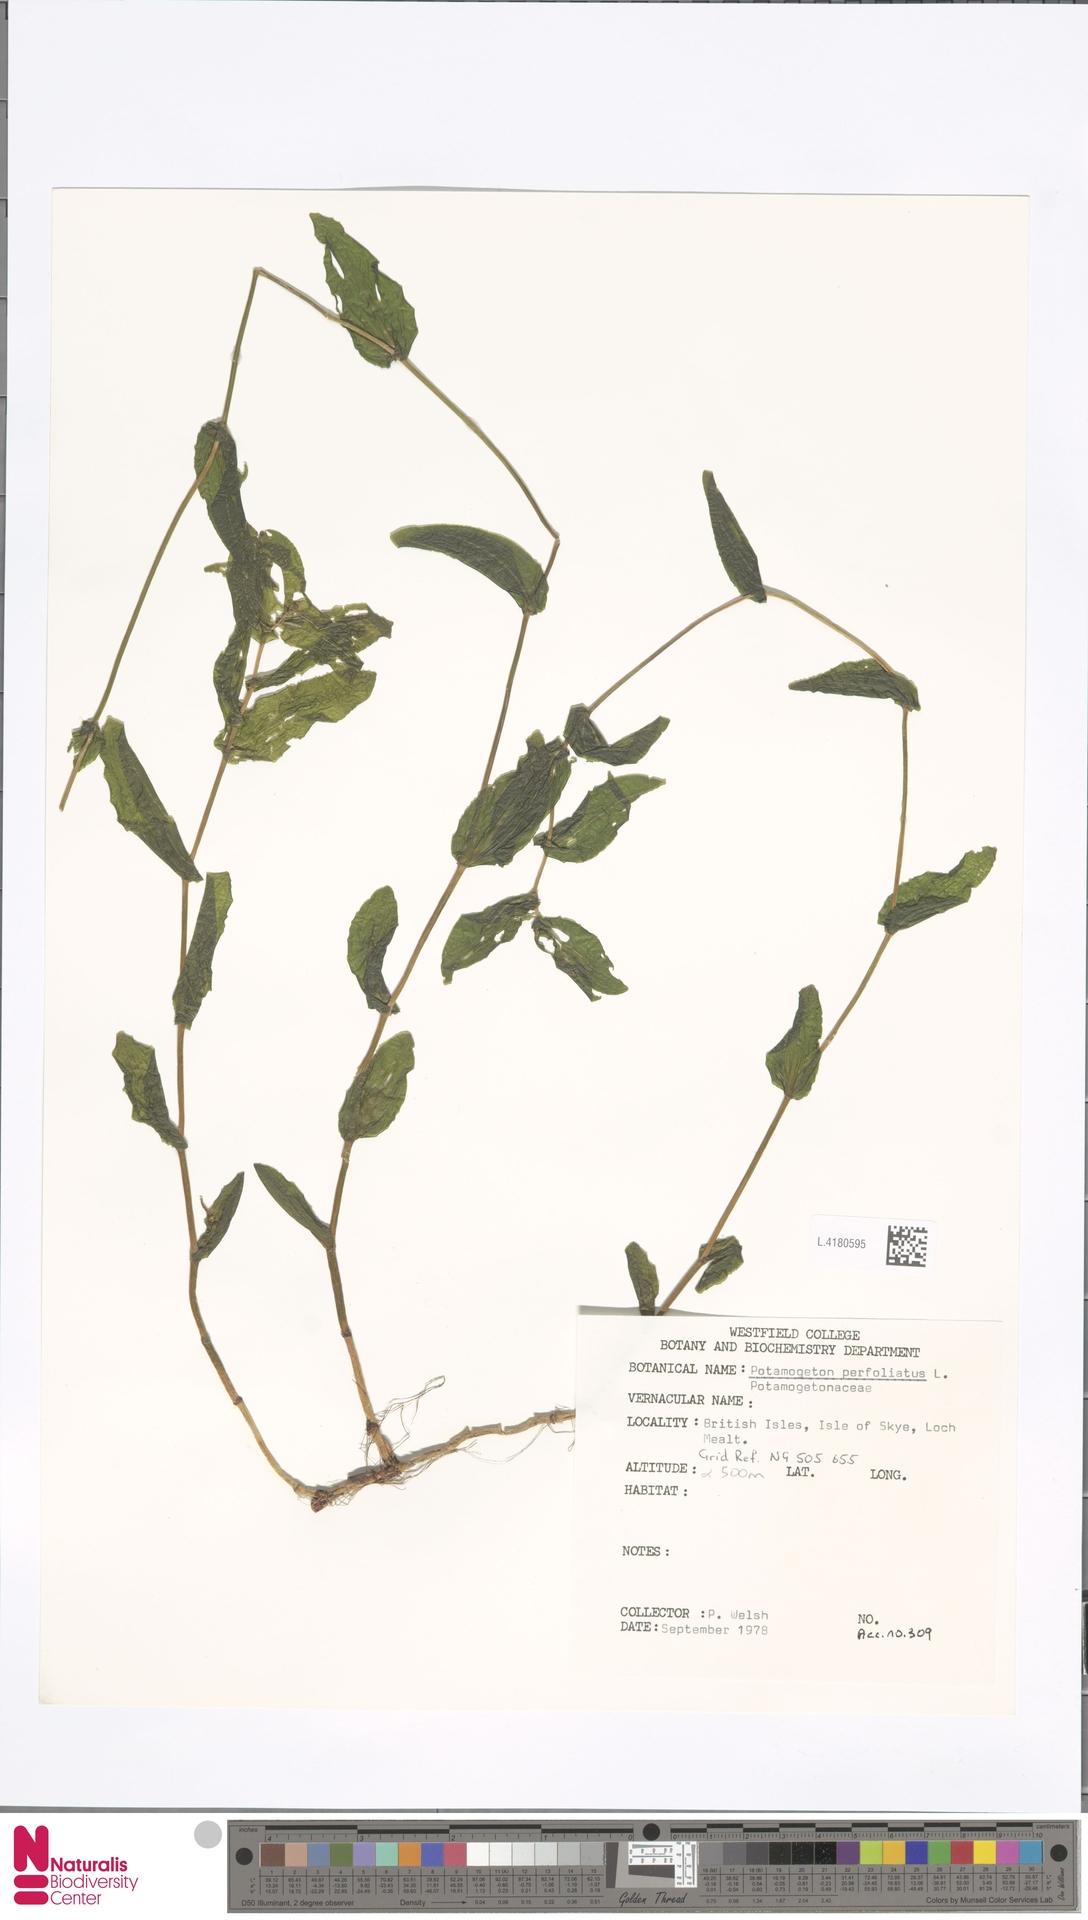 L.4180595 | Potamogeton perfoliatus L.